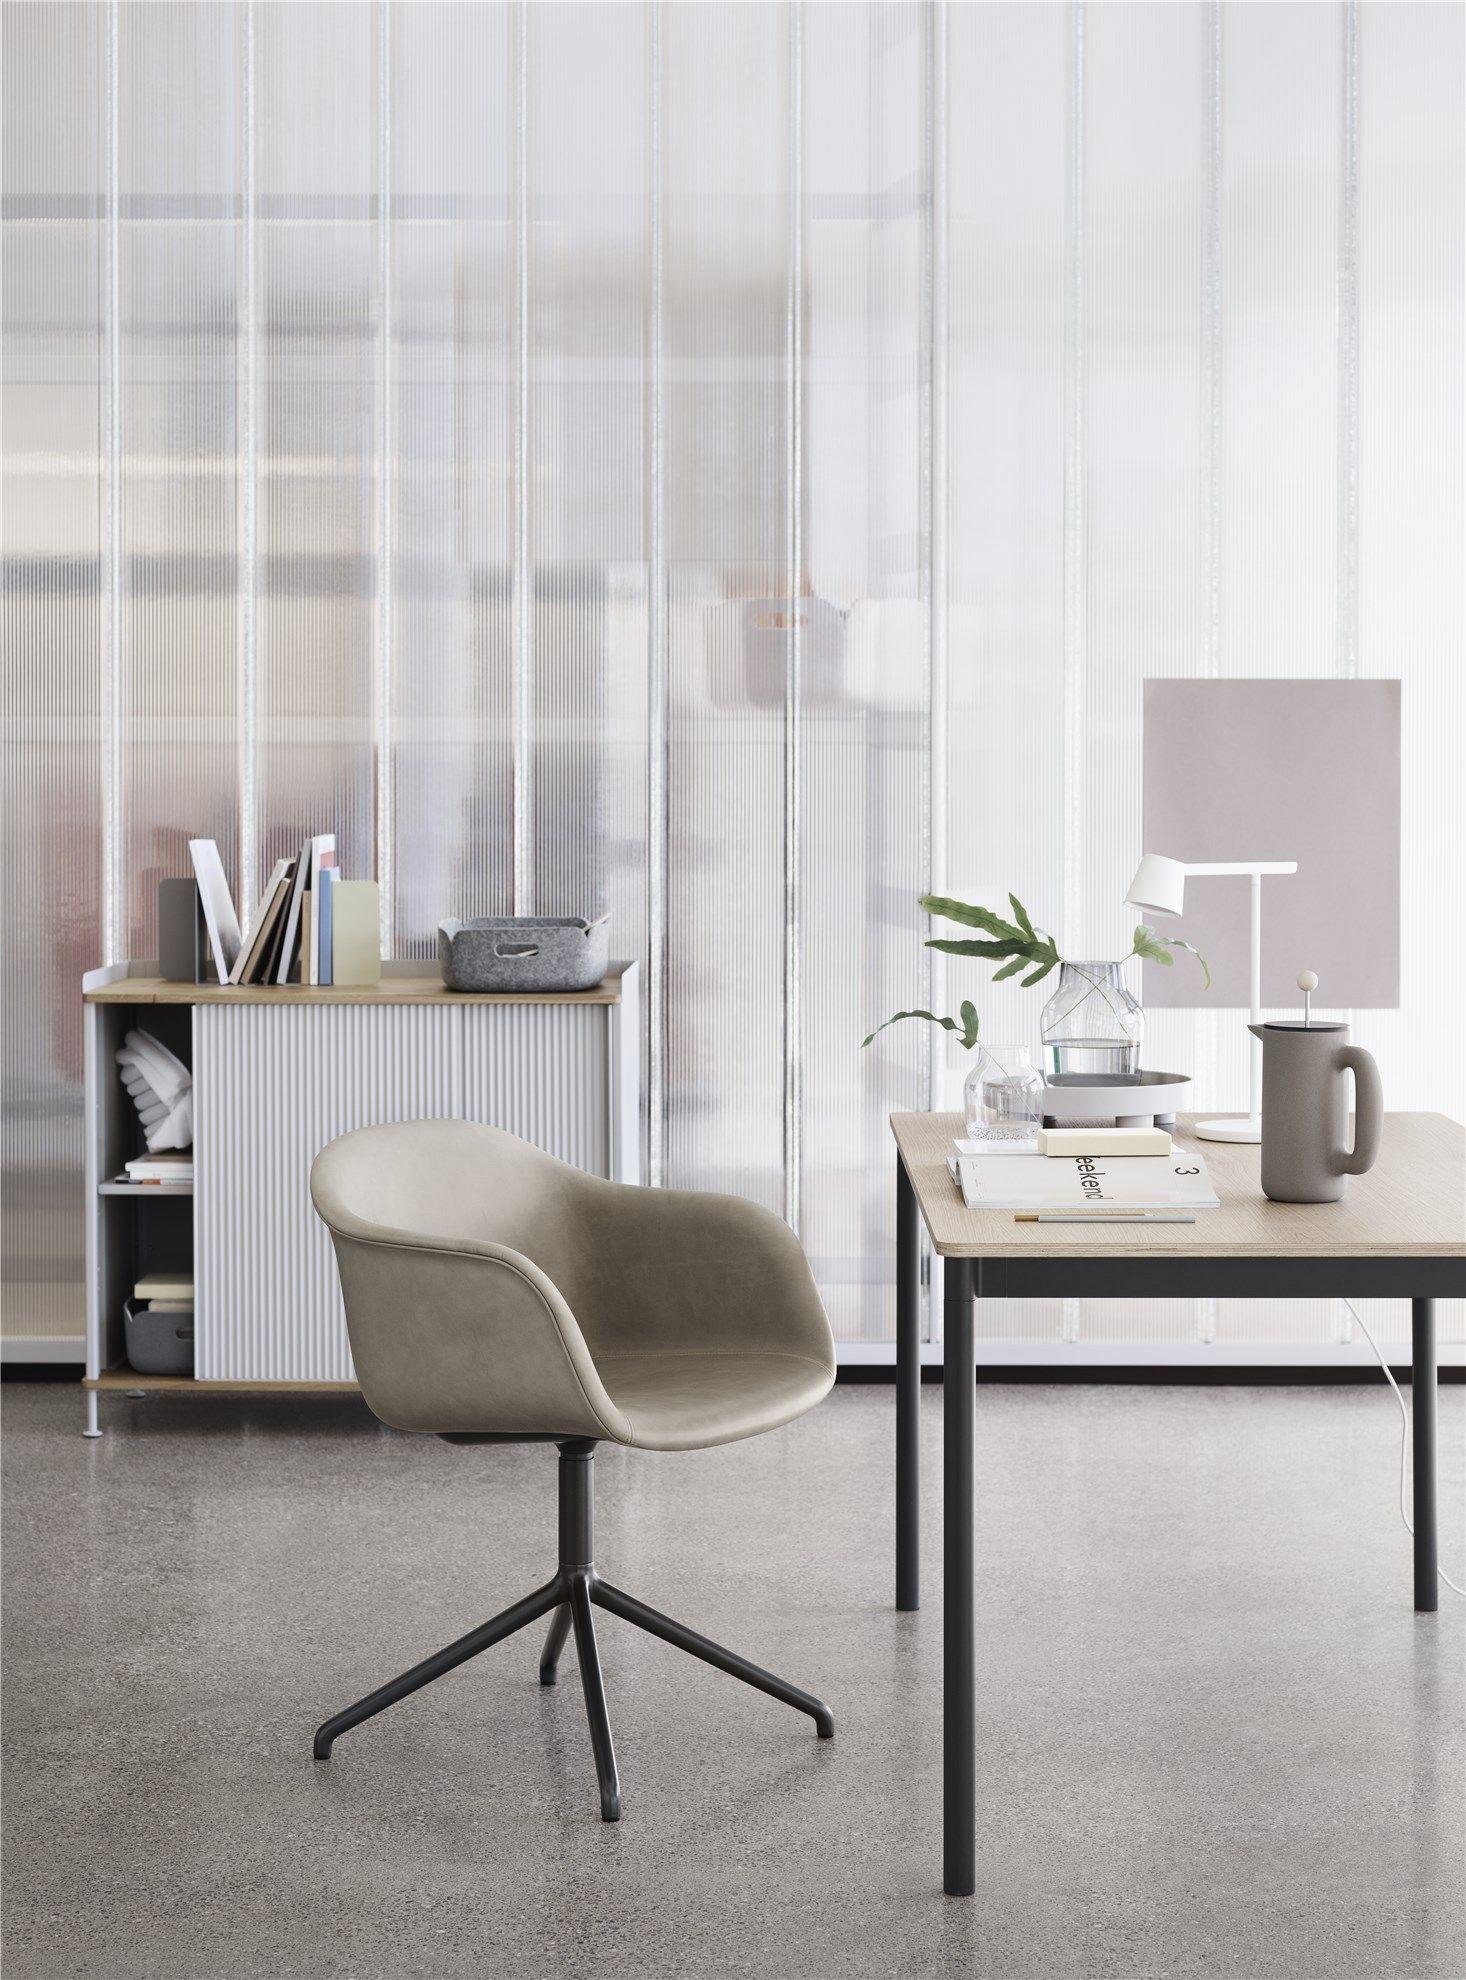 Muuto Aw18 Coco Lapine Design Office Interior Design Scandinavian Style Sideboard Furniture